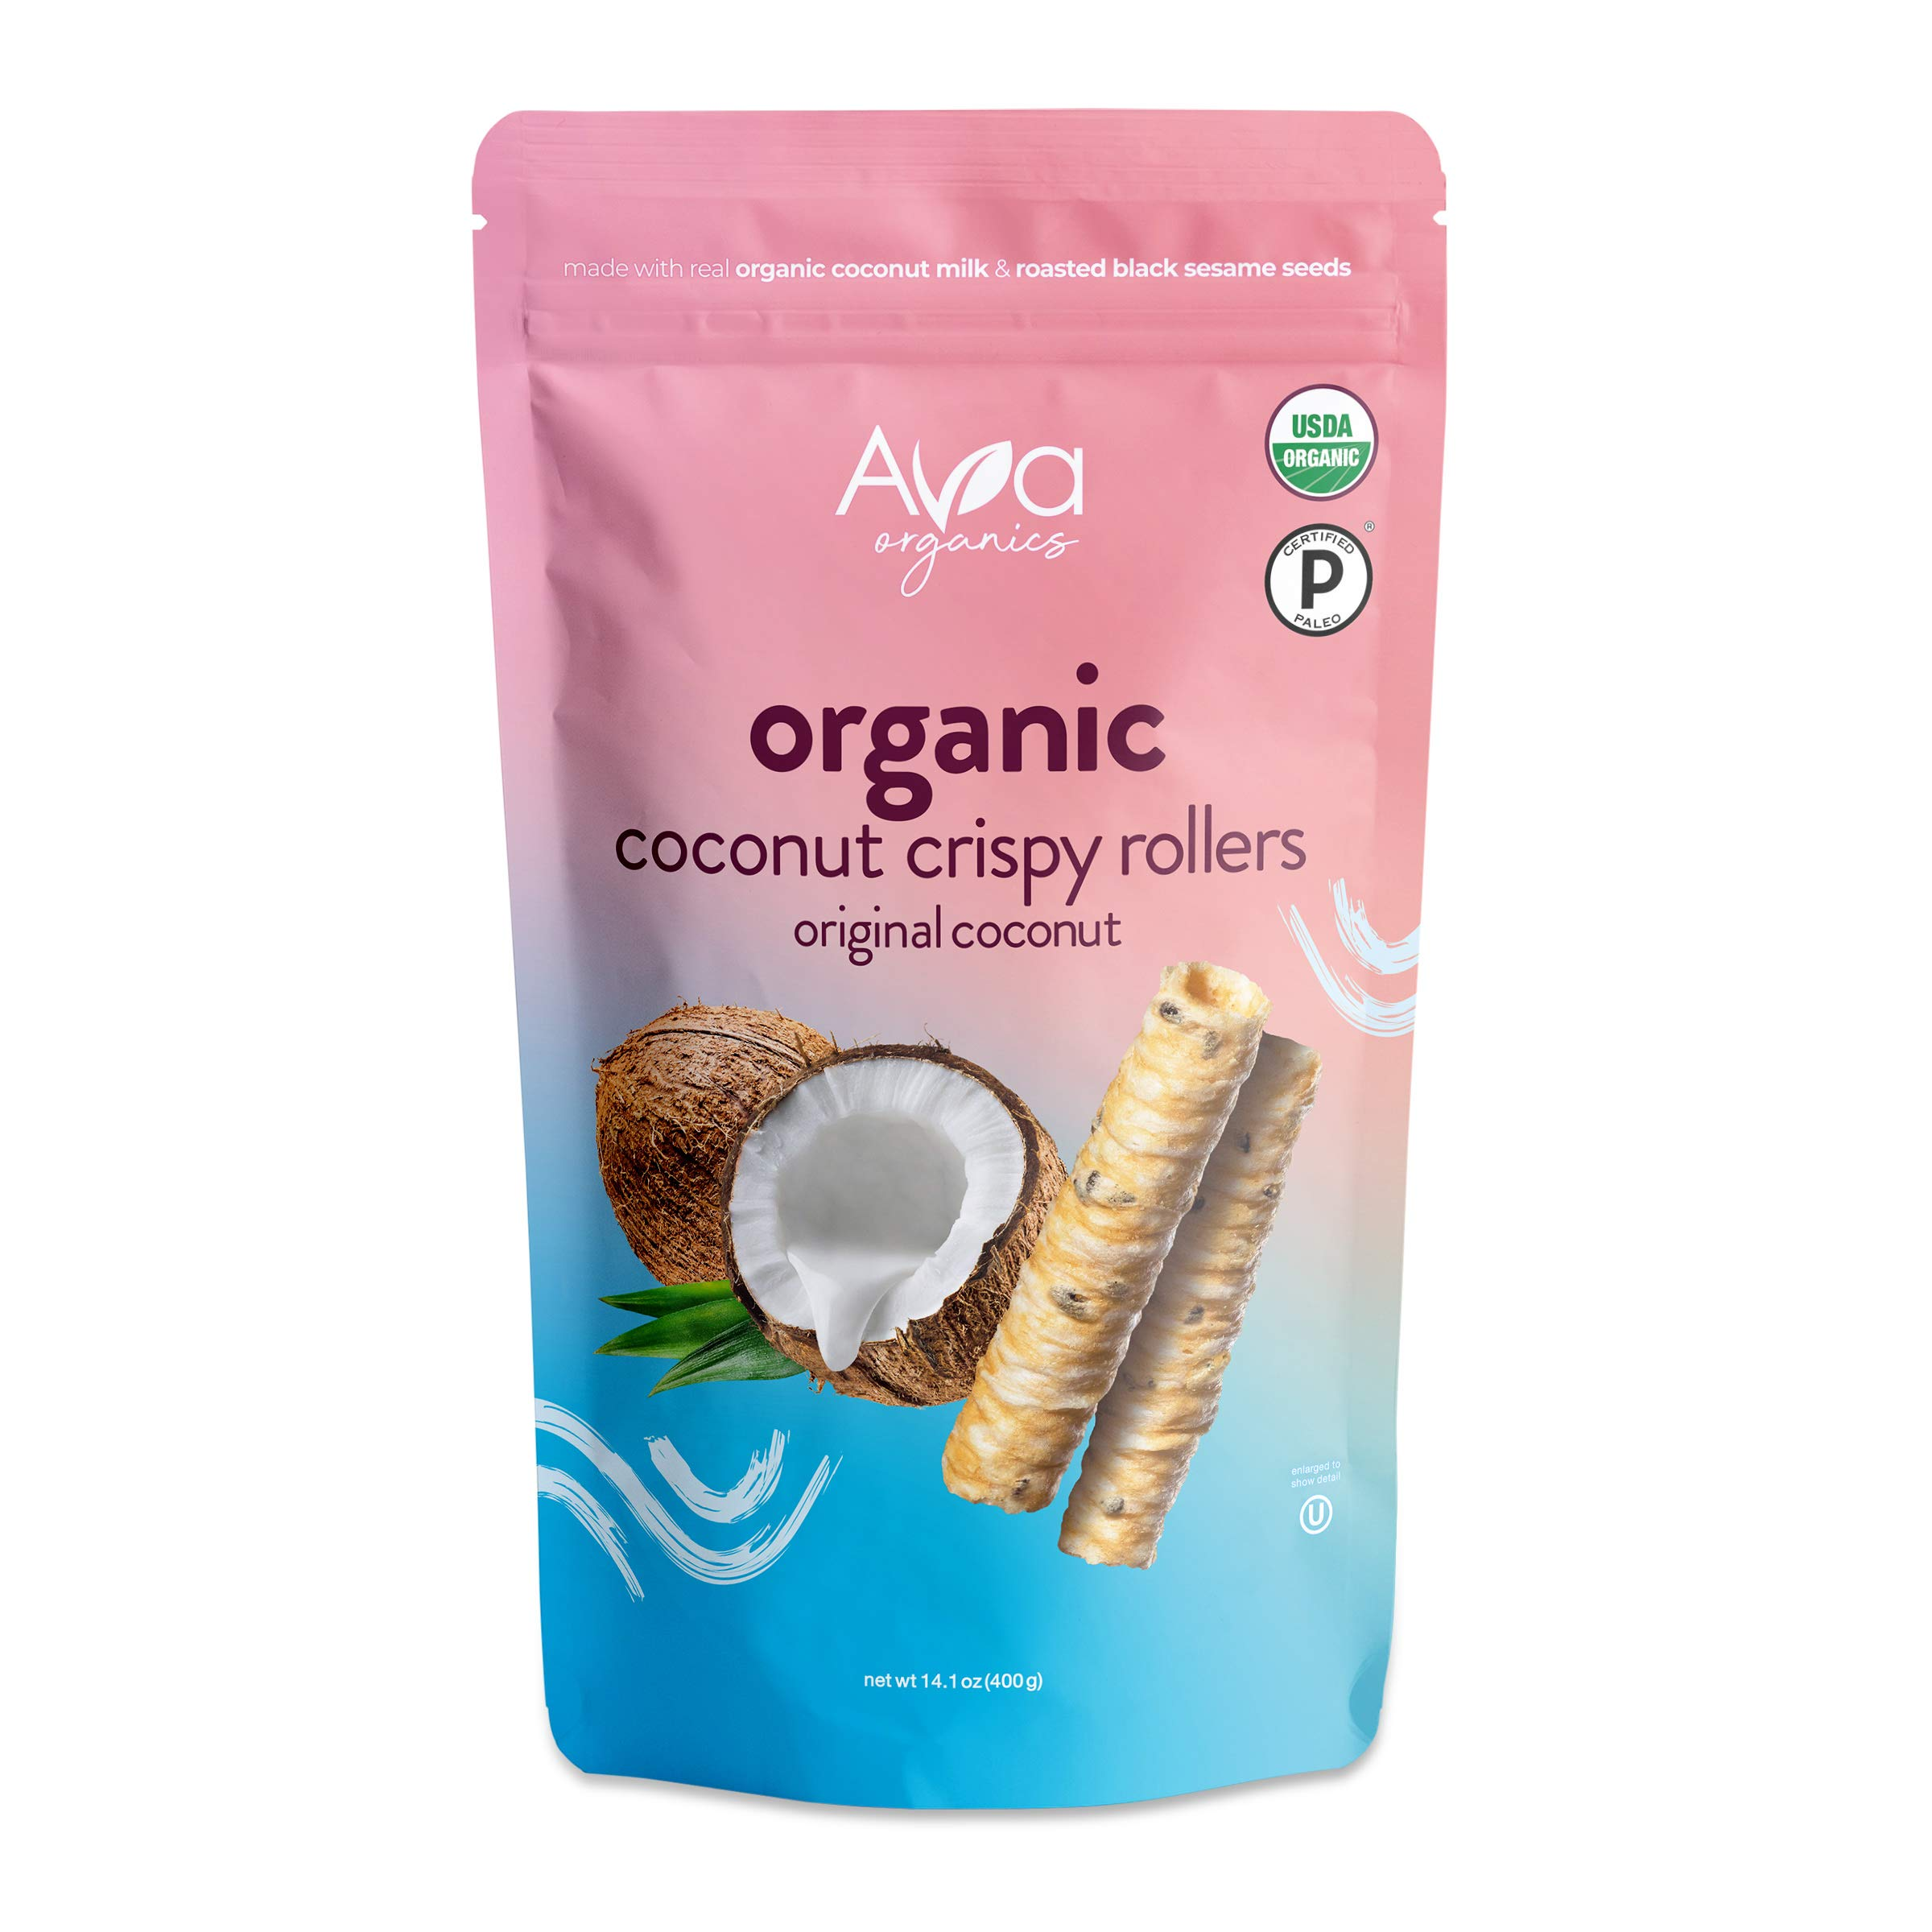 Ava Organics - Coconut Crispy Rollers - Original Coconut (Family Size 14 oz bag)